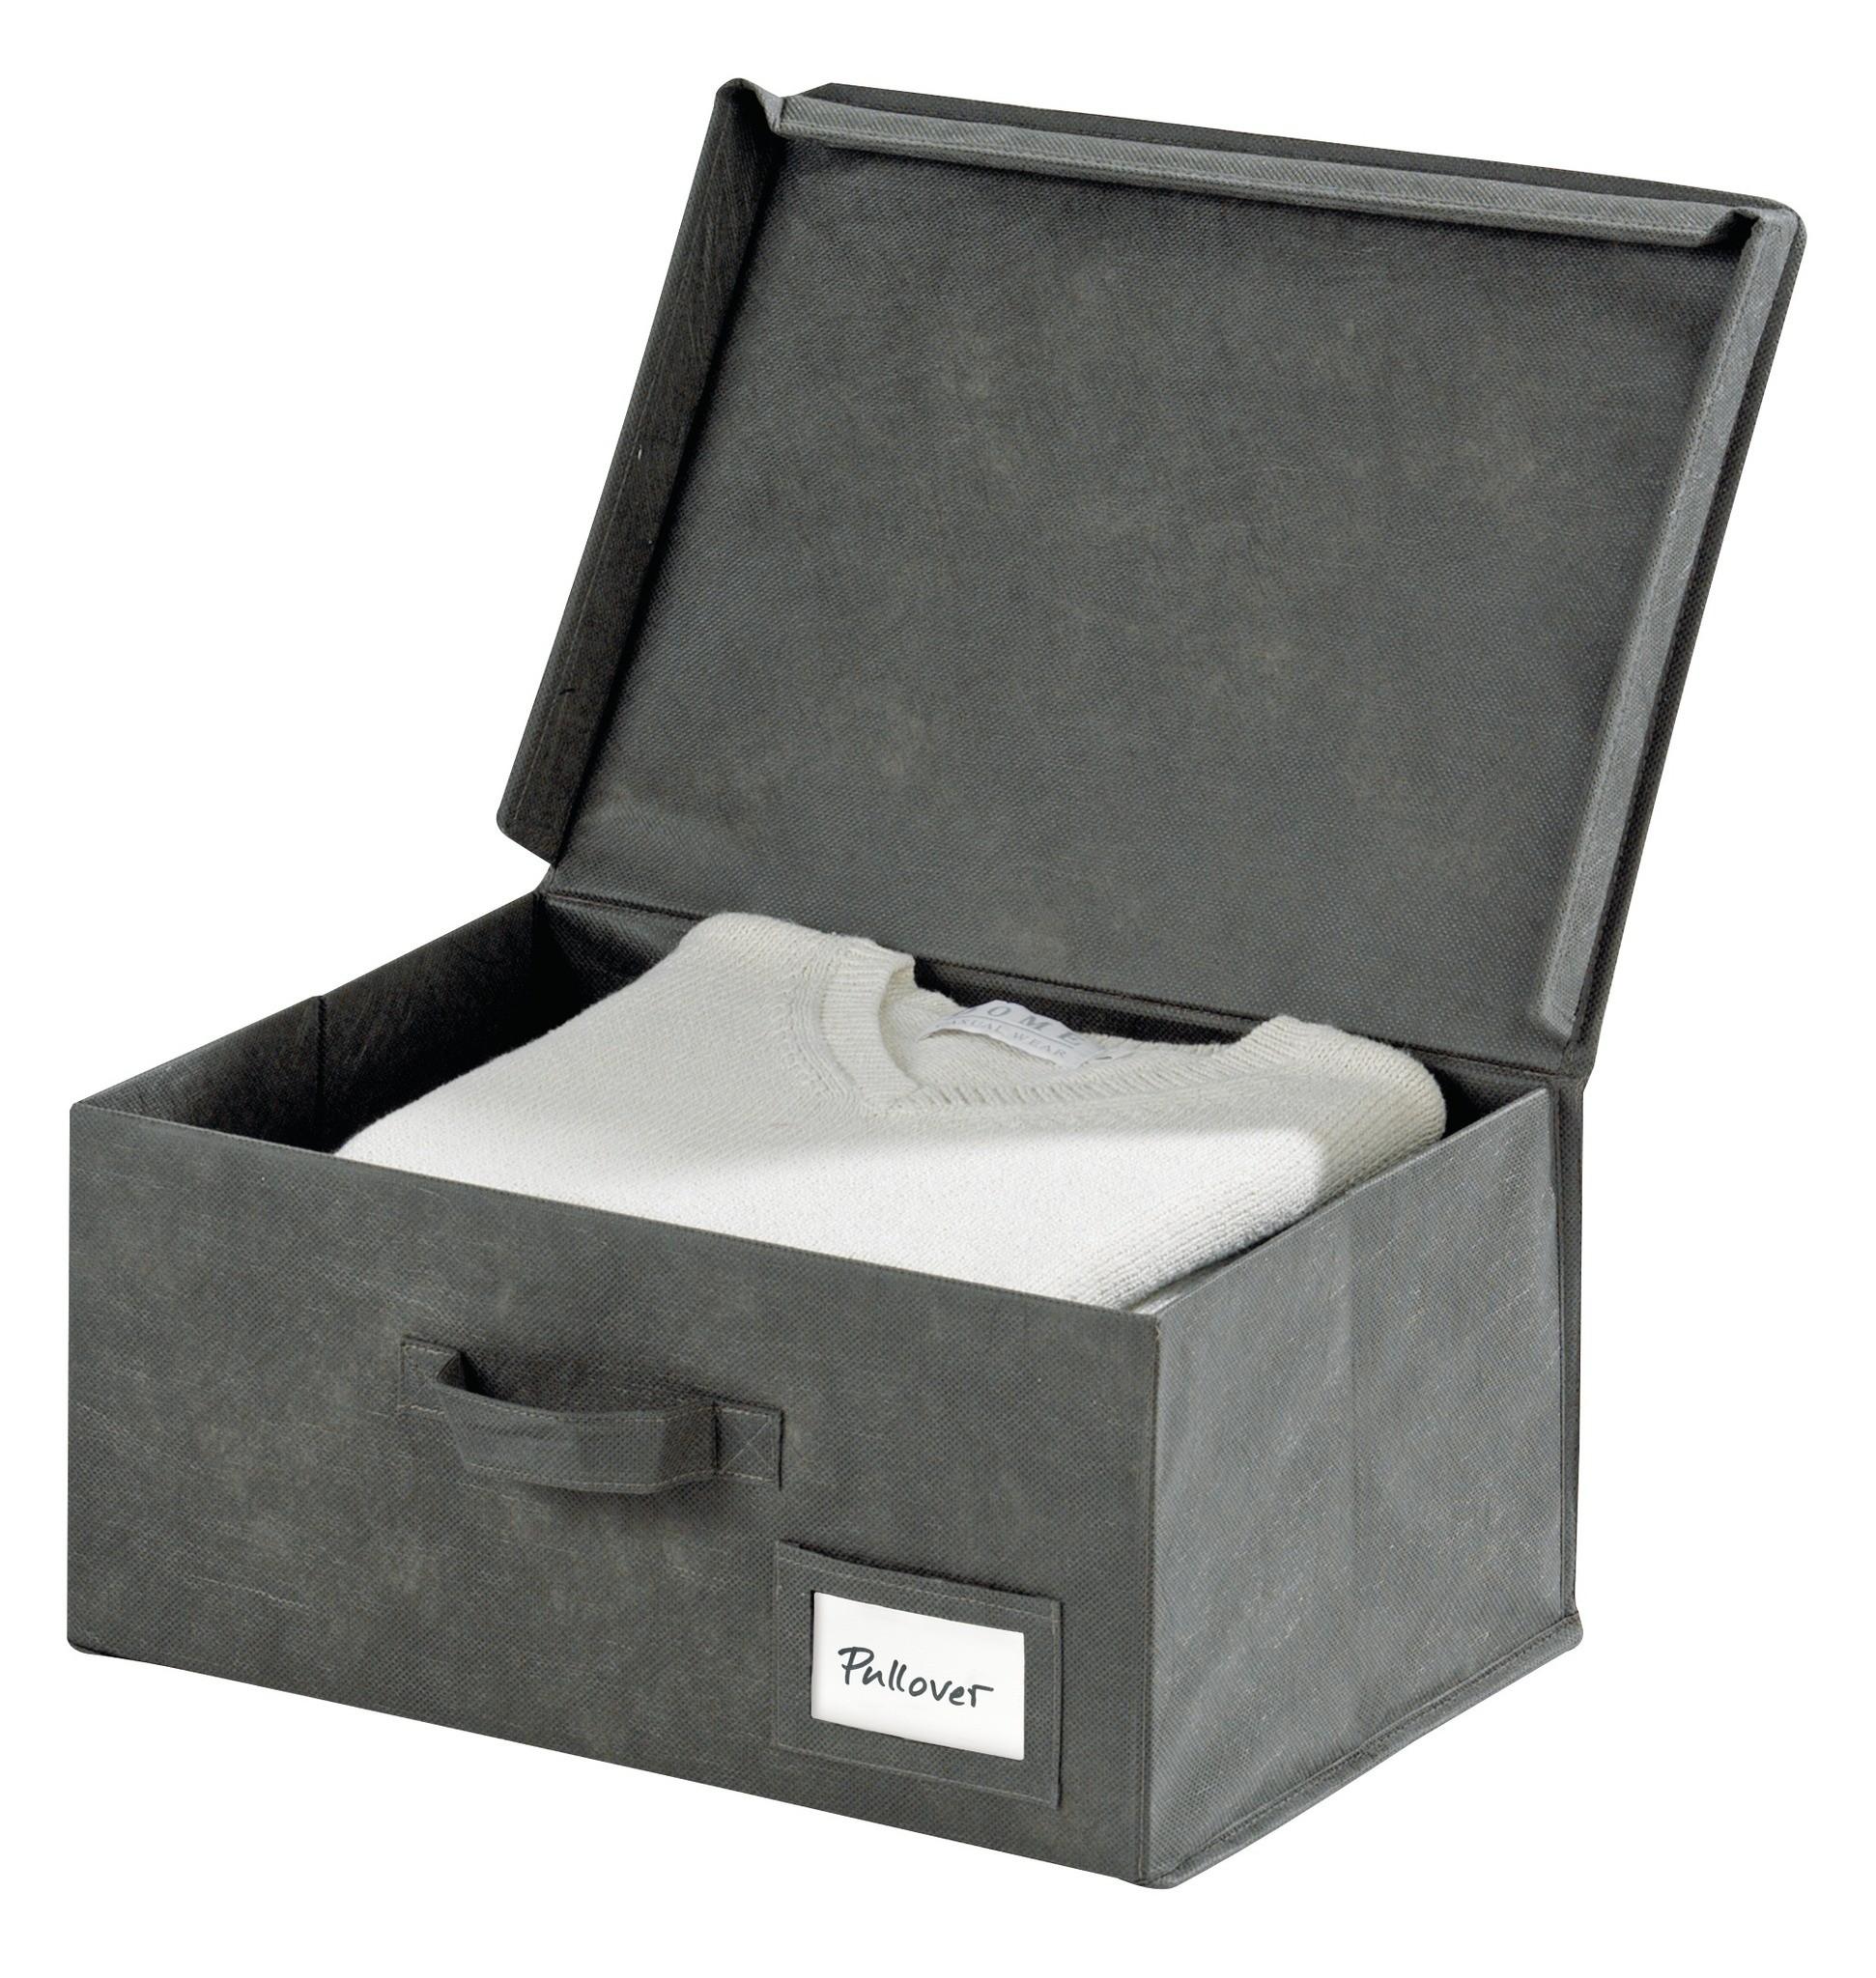 Aufbewahrungsbox Libertà, 4er Set, je 45 x 33 x 20 cm